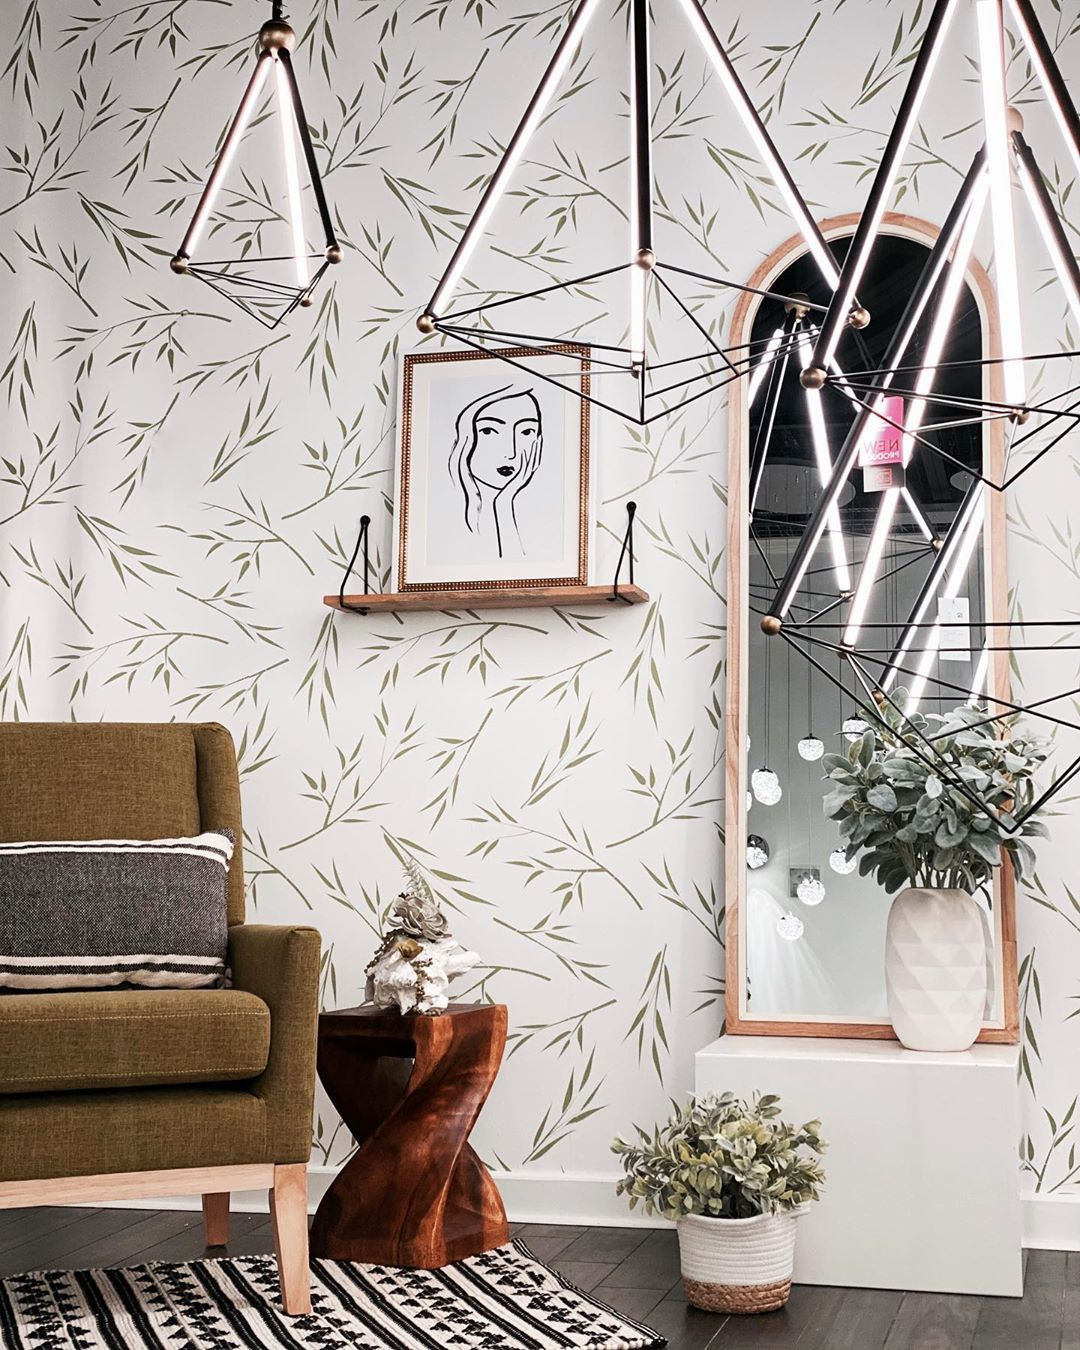 Tranquility Garden Zen Wallpaper Bohemian Wallpaper Inspire Me Home Decor